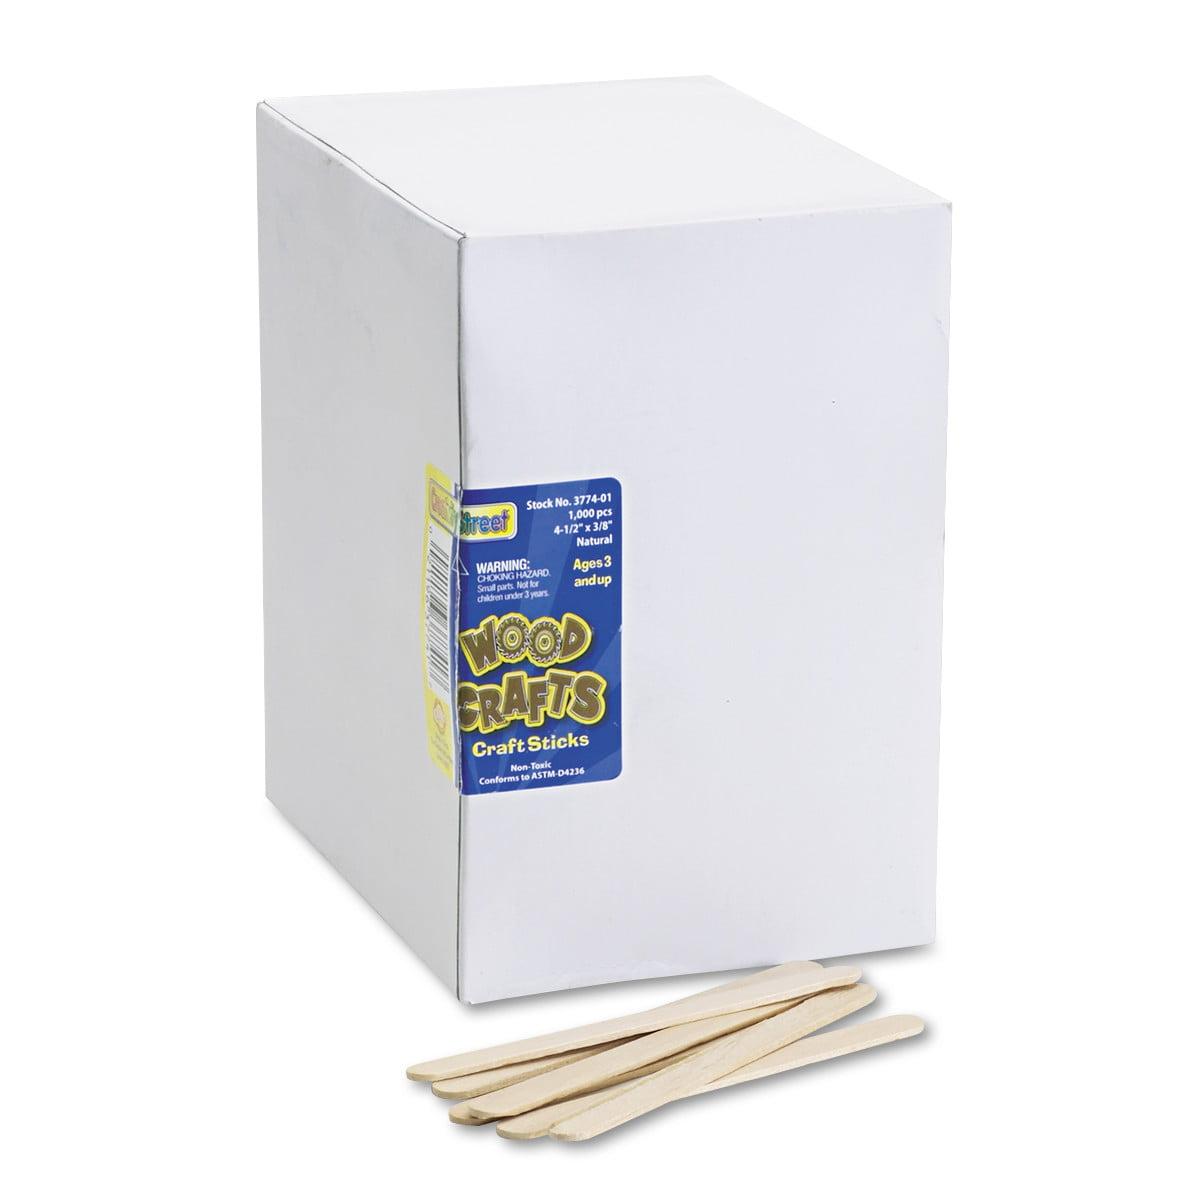 Chenille Kraft Natural Wood Craft Sticks, 4 1/2 x 3/8, Wood, Natural, 1000/Box